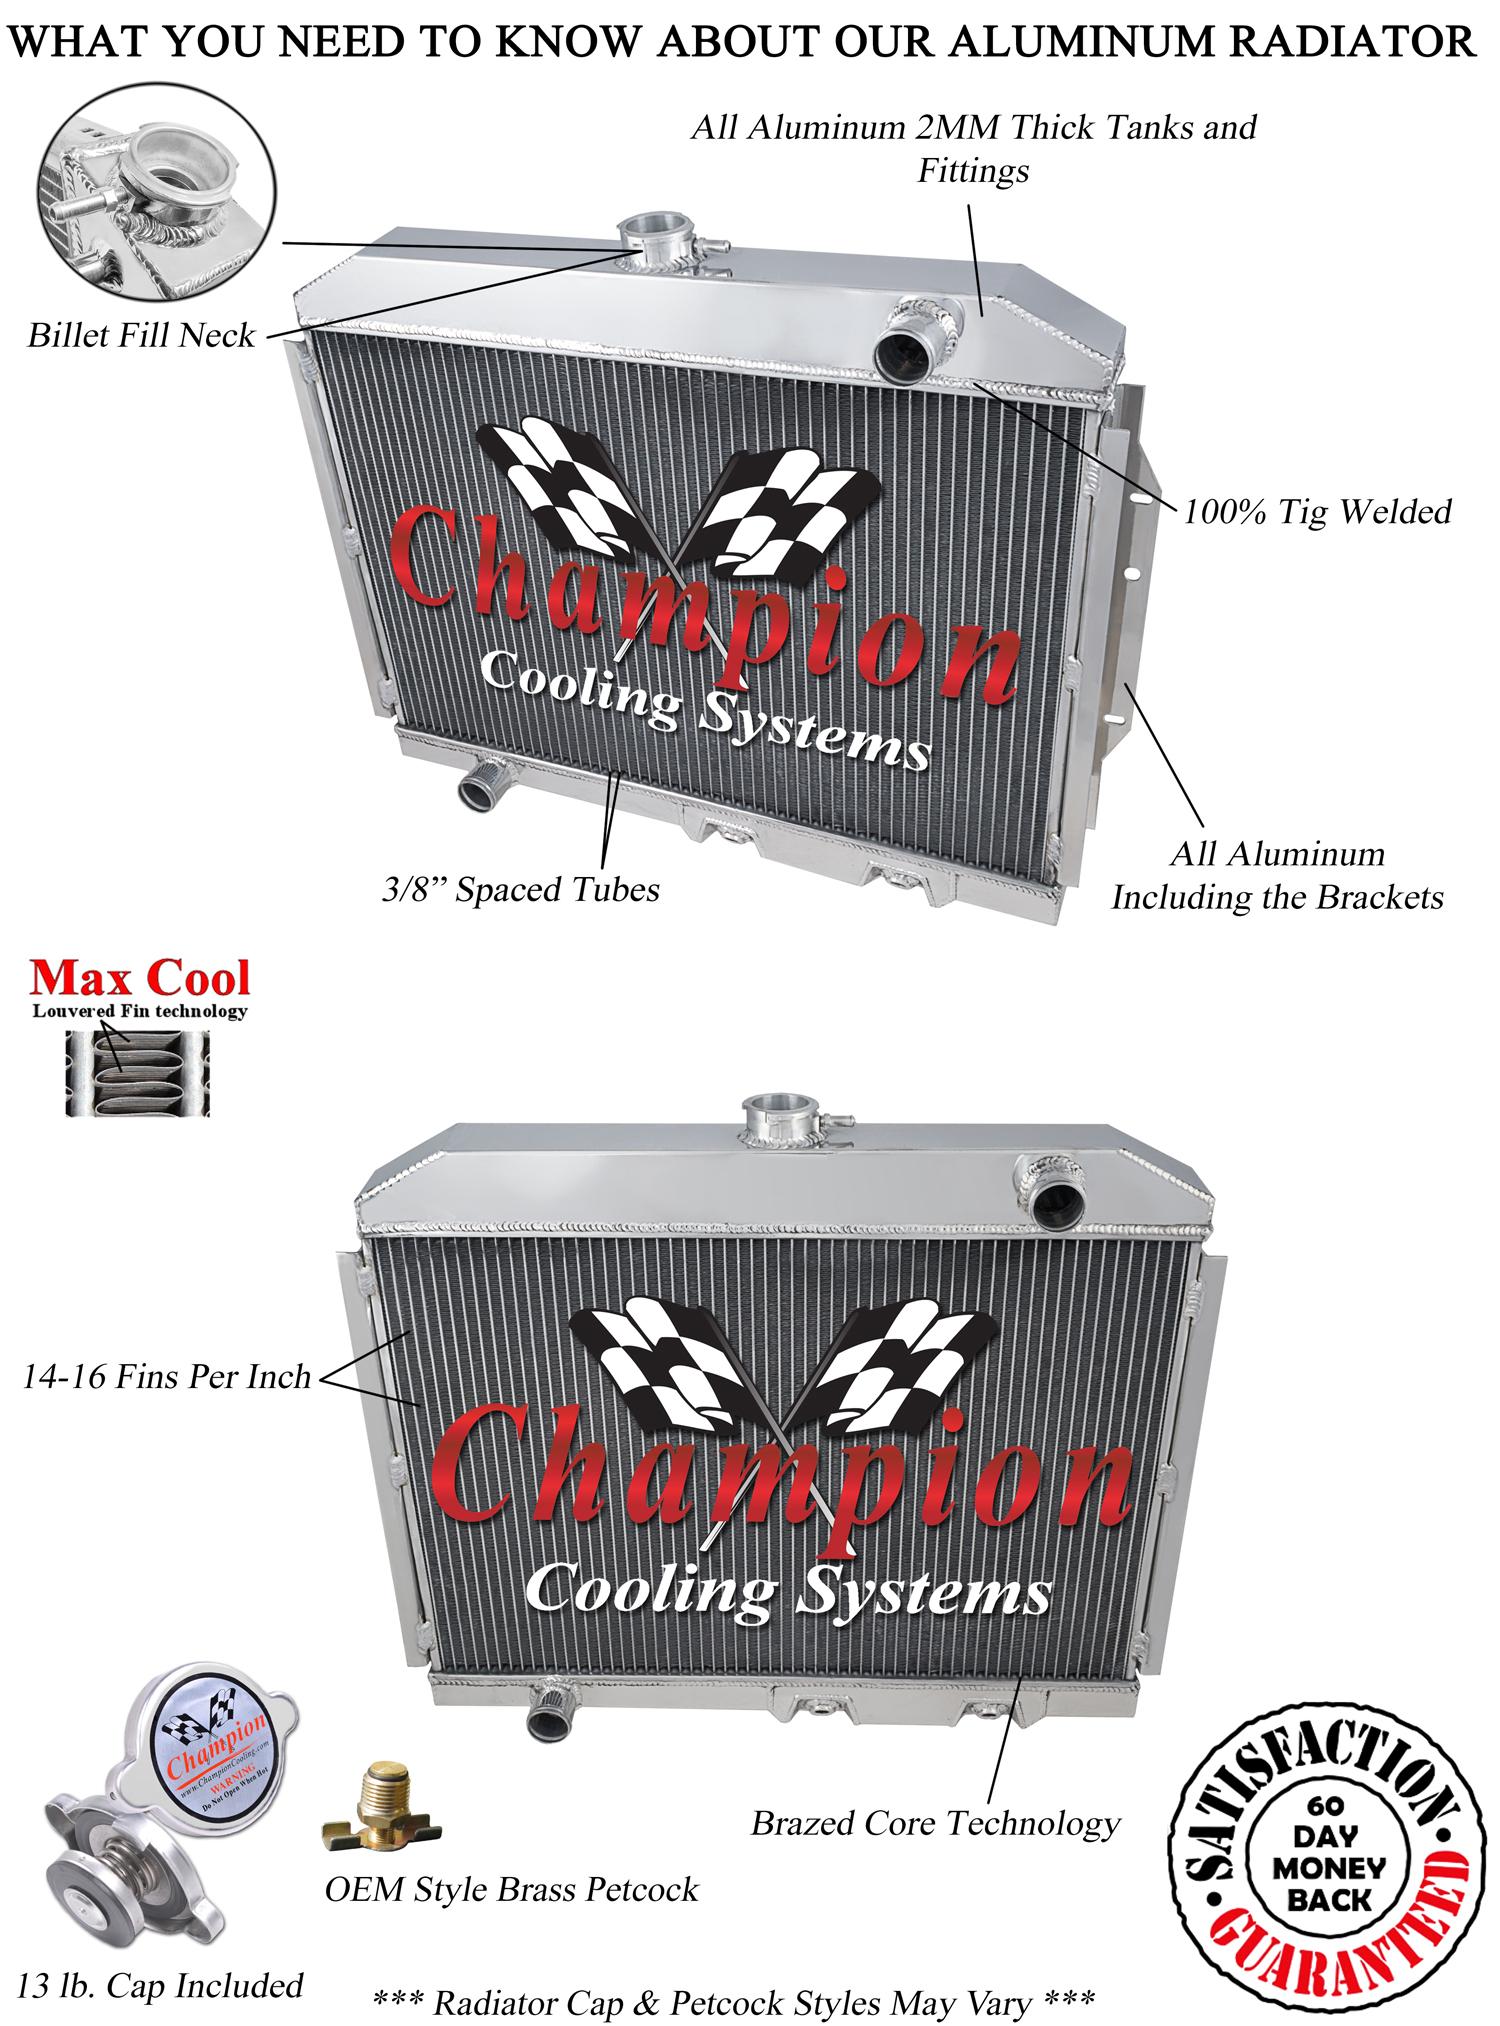 https://www.championcooling.com/photos/Photos%20White/Without%20Fans/403/403_white_Diagram_Champion.jpg